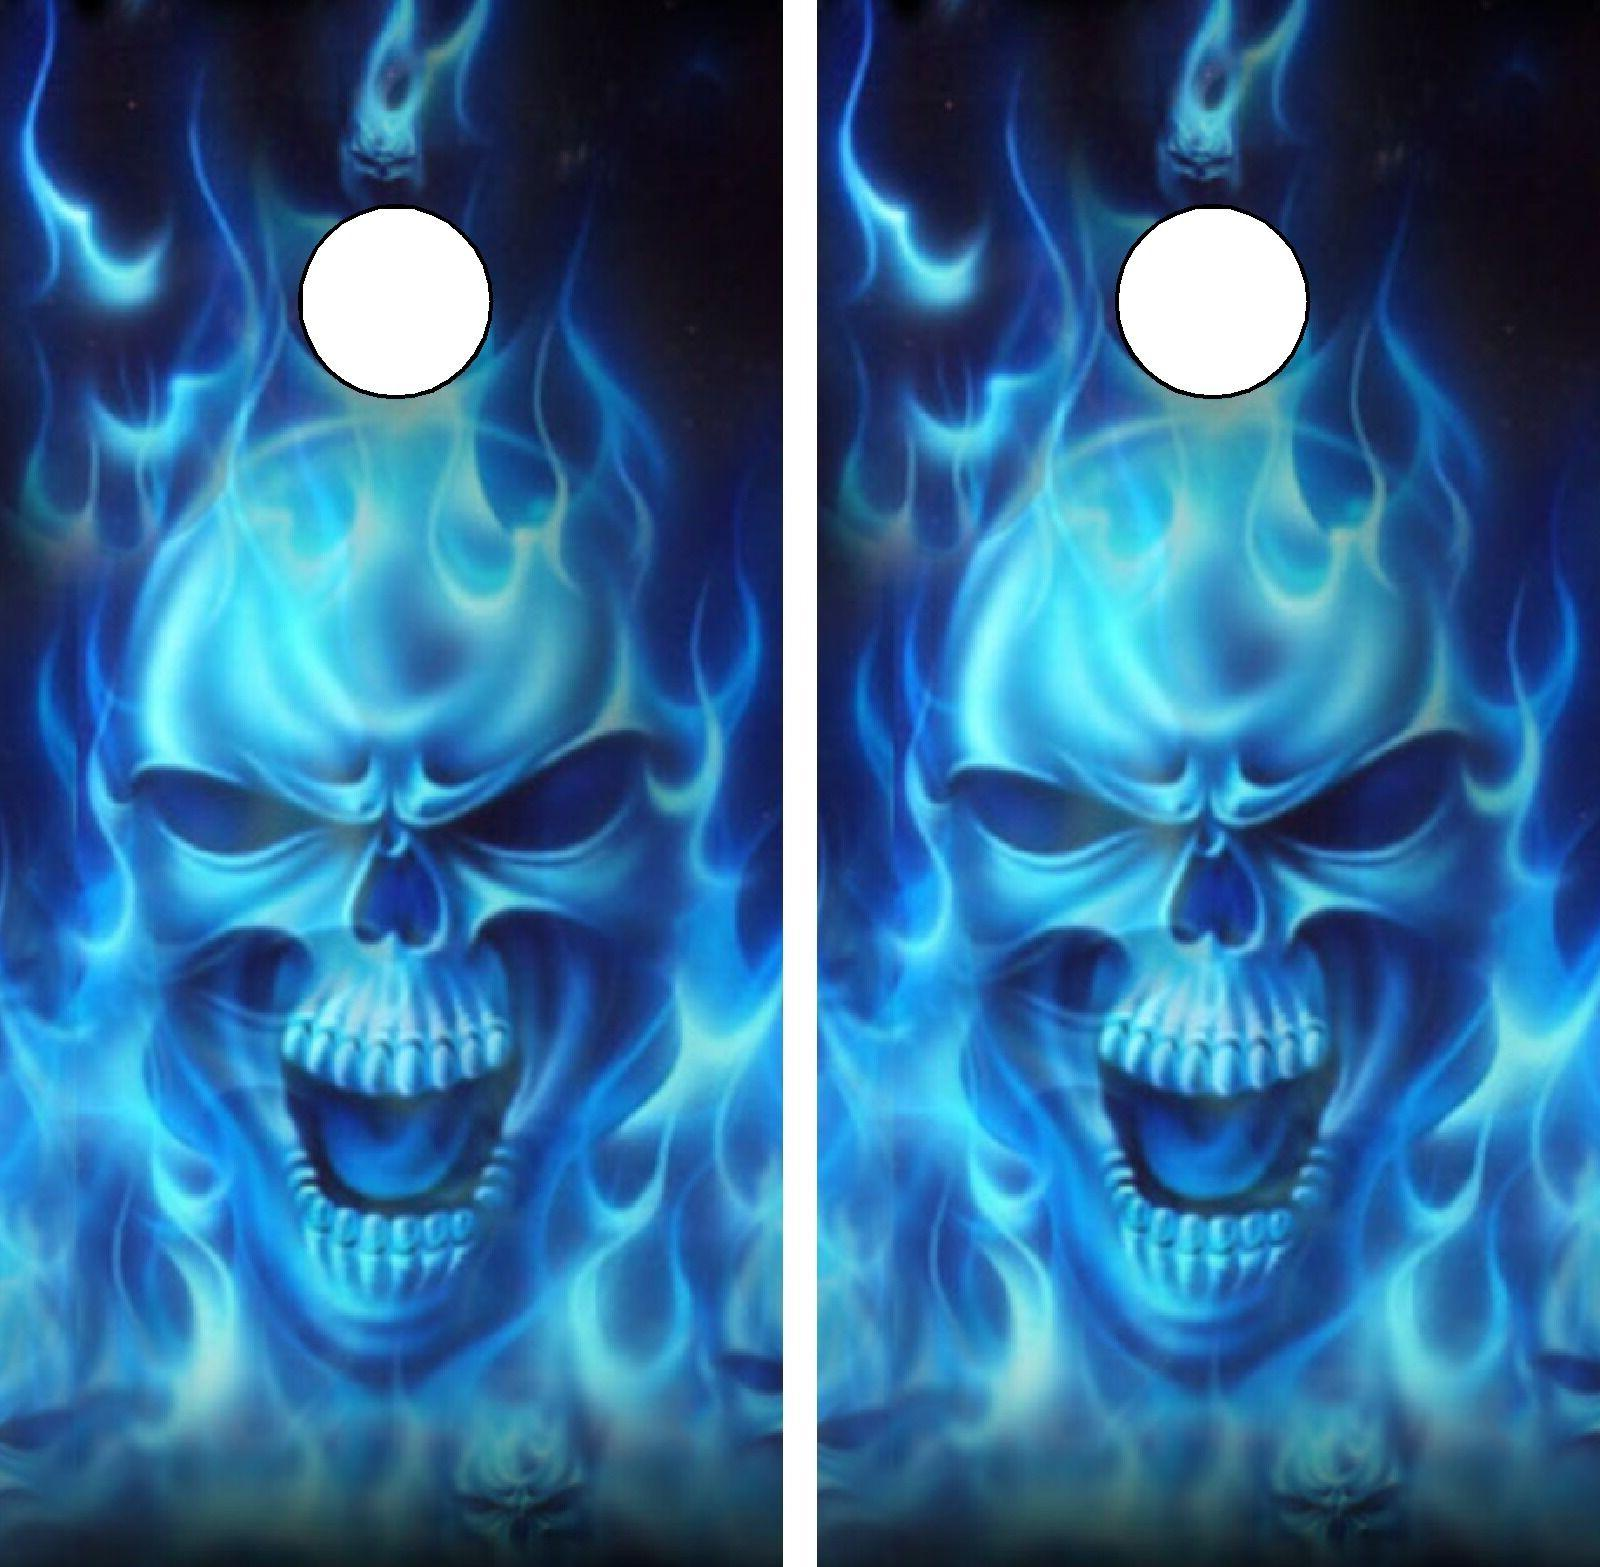 C15 Flaming Skull Cornhole Board Wrap LAMINATED Wraps Decals